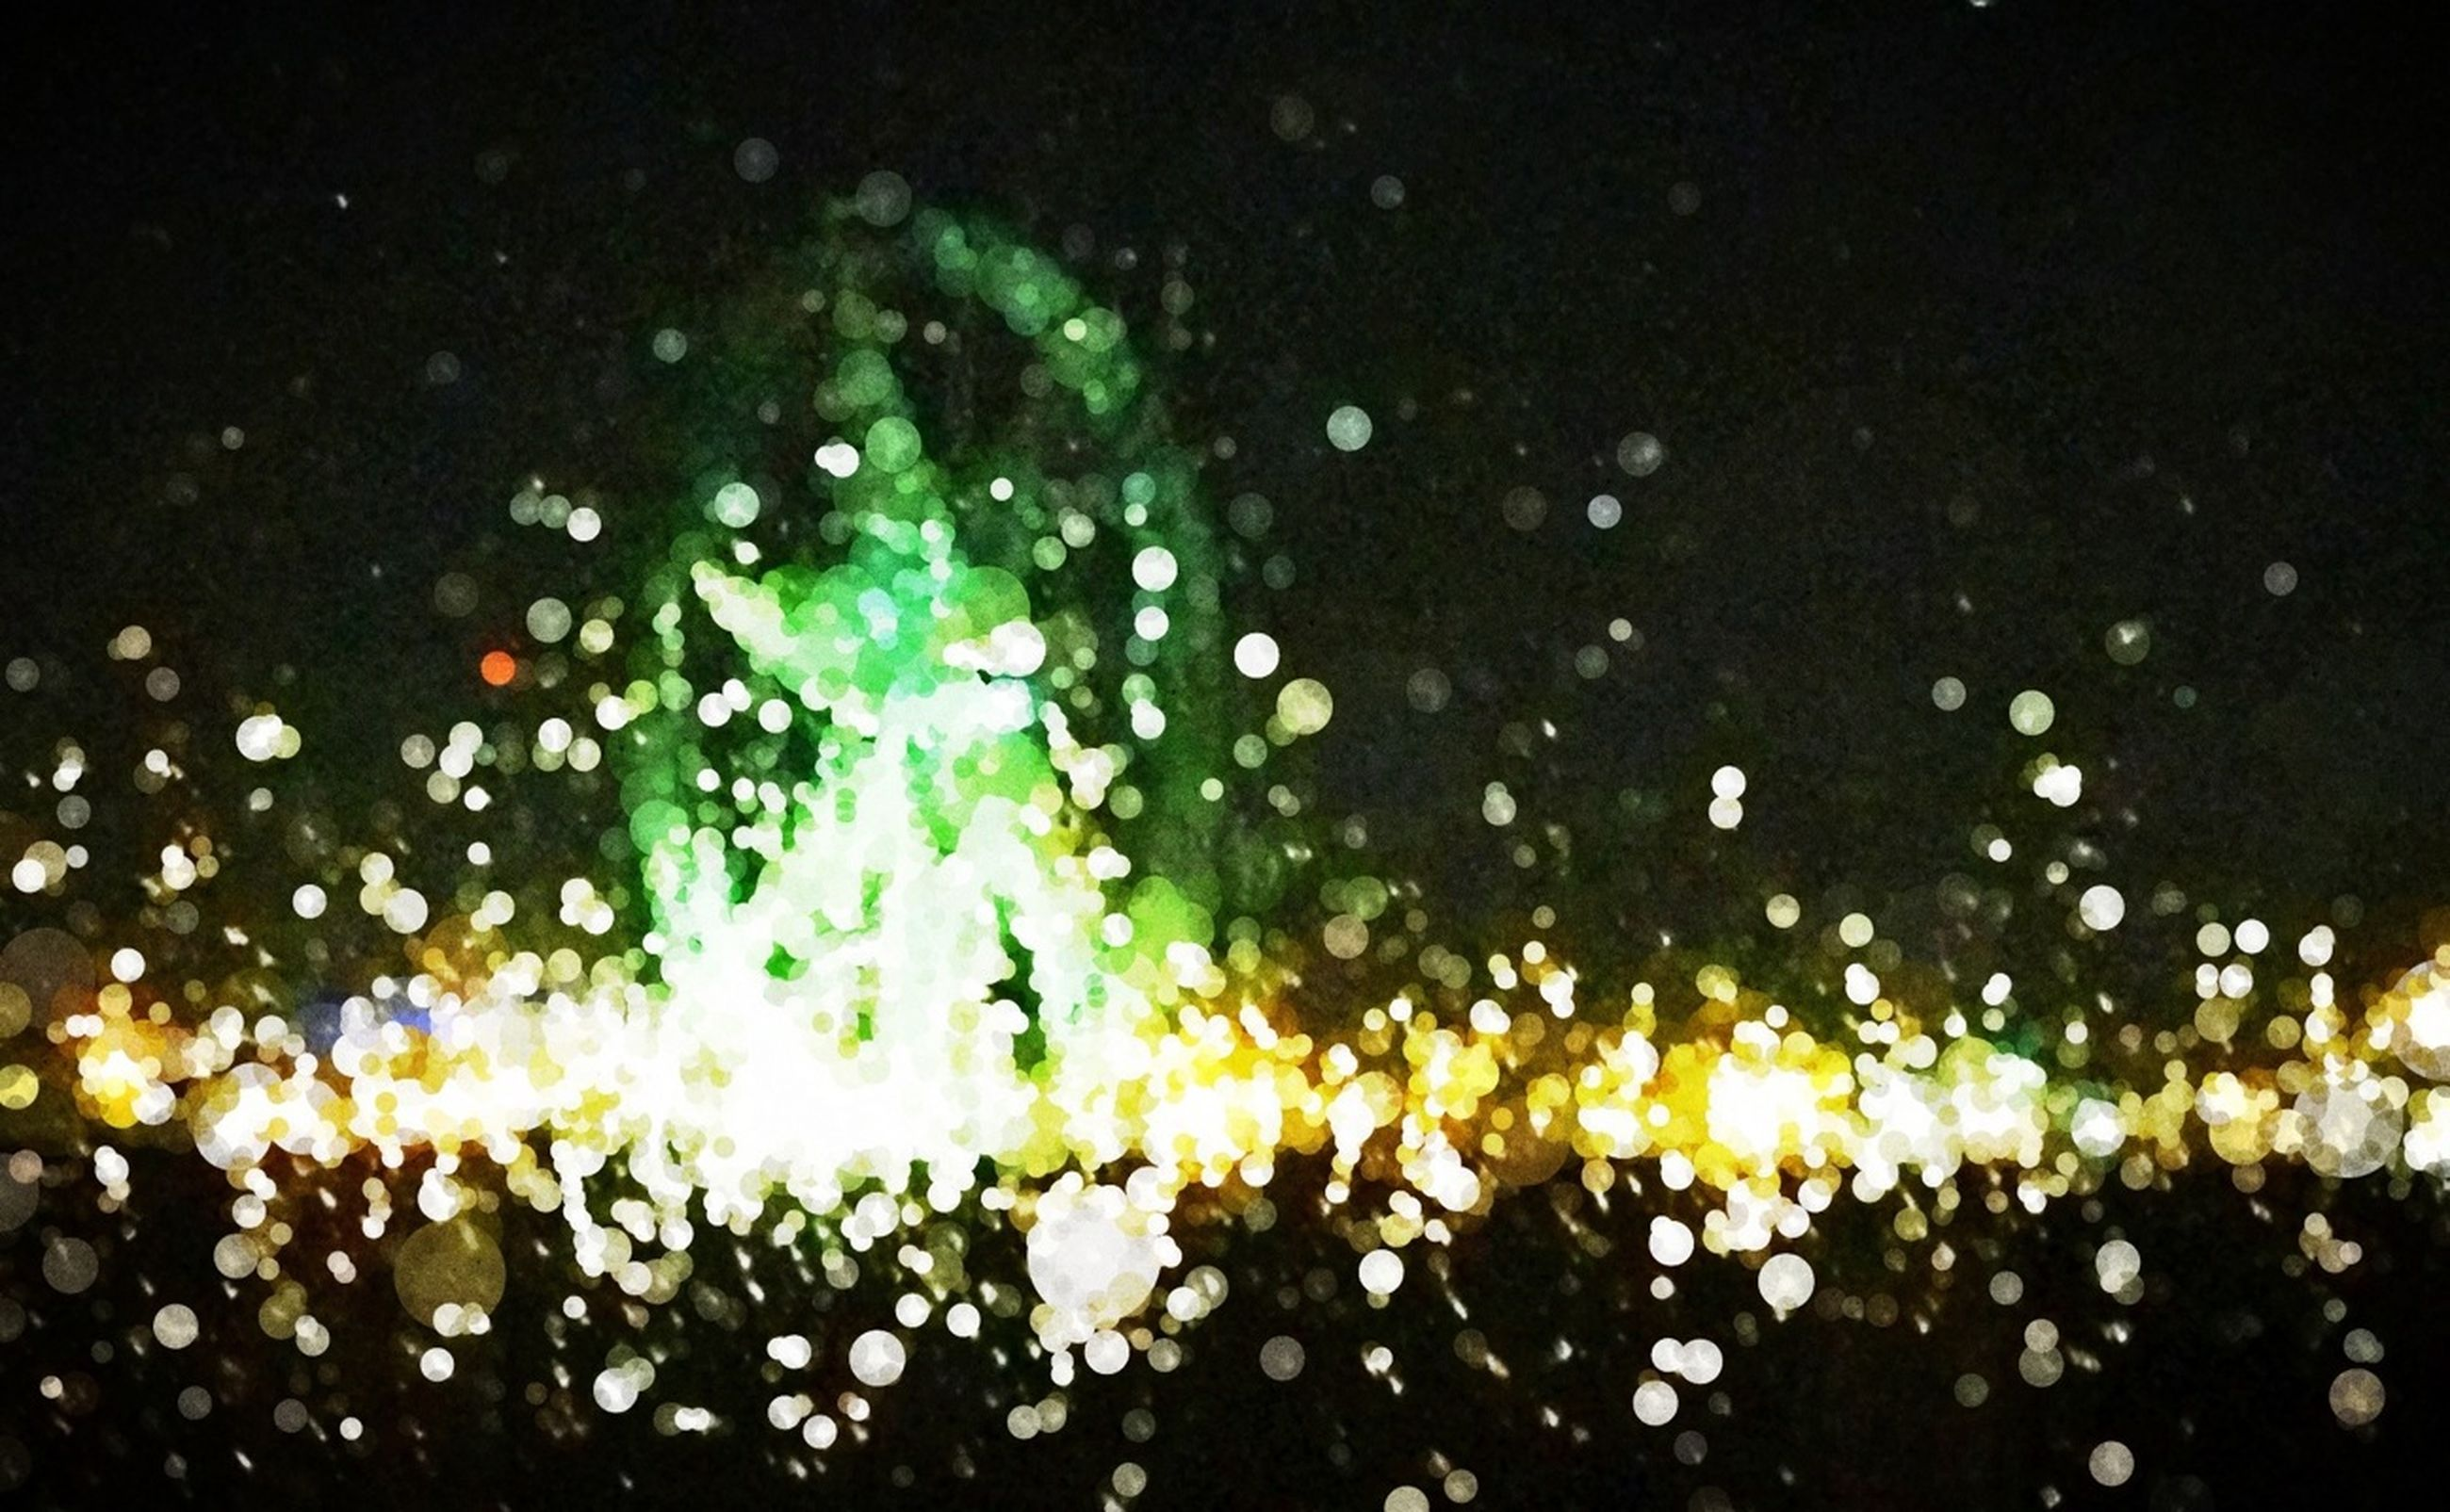 night, illuminated, wet, rain, drop, water, full frame, backgrounds, window, defocused, indoors, light - natural phenomenon, glass - material, transparent, raindrop, no people, dark, street, close-up, pattern